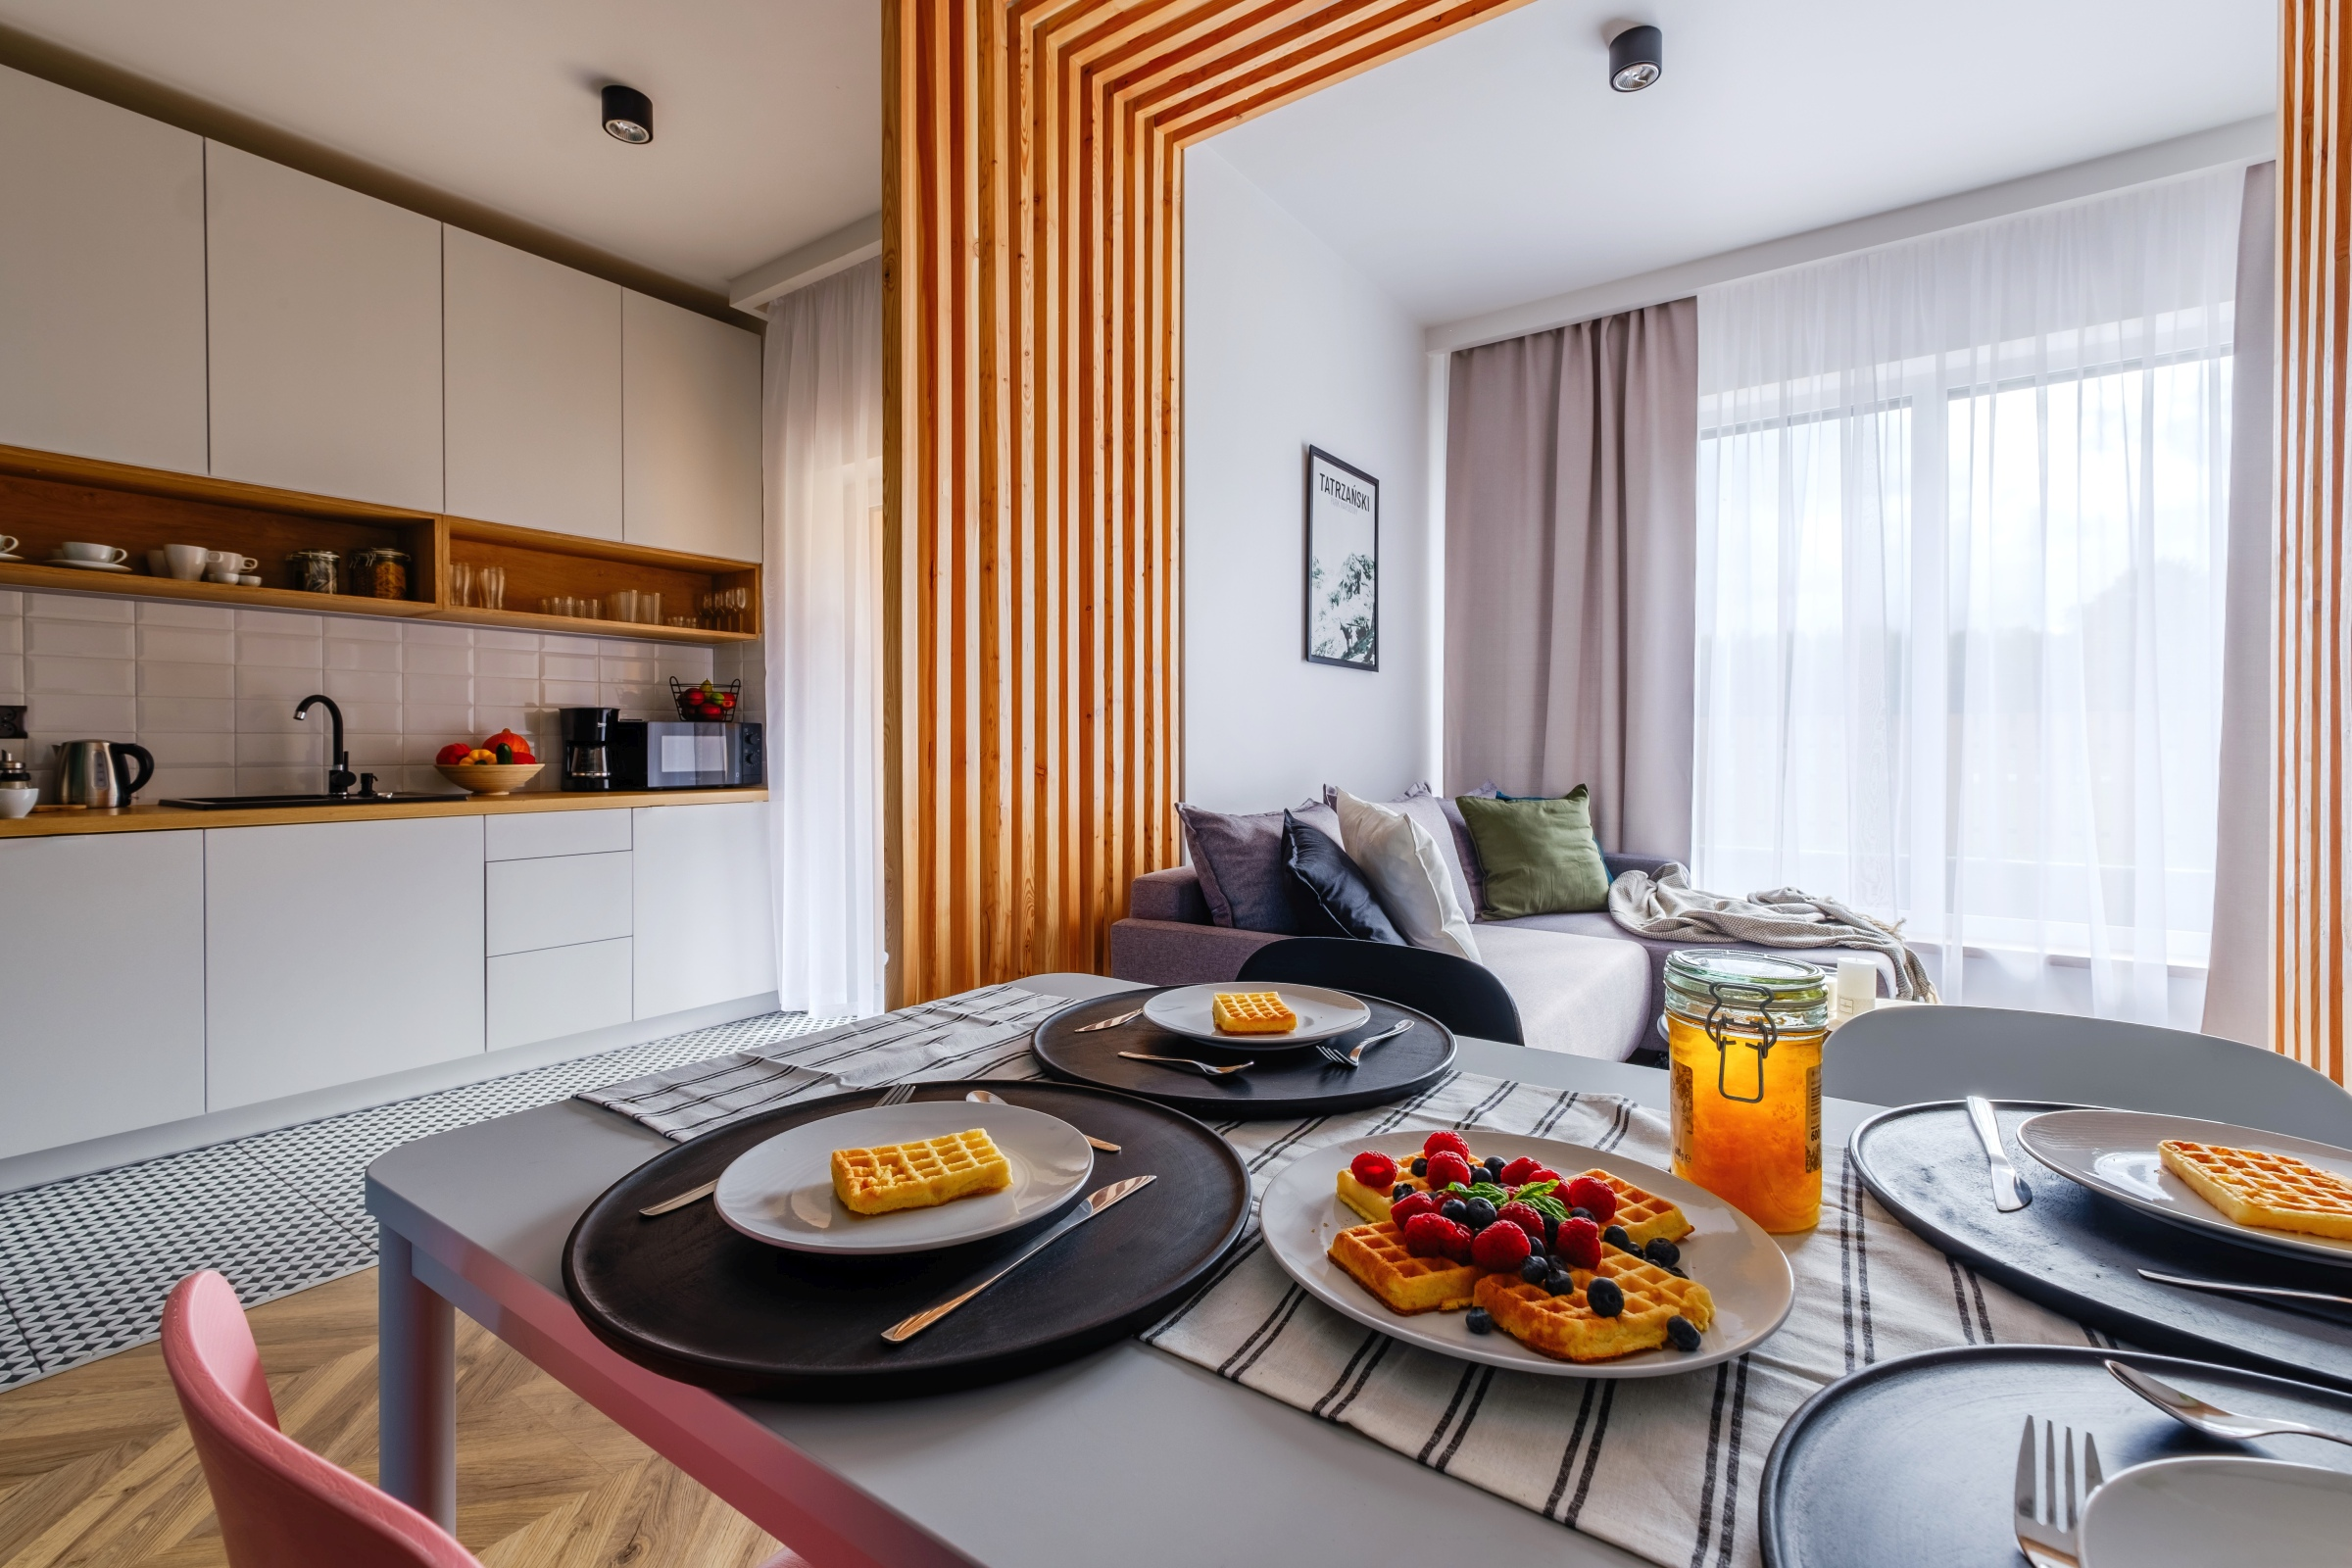 Apartamenty NOVA BIAŁKA Białka Tatrzańska apartament 5 jadalnia